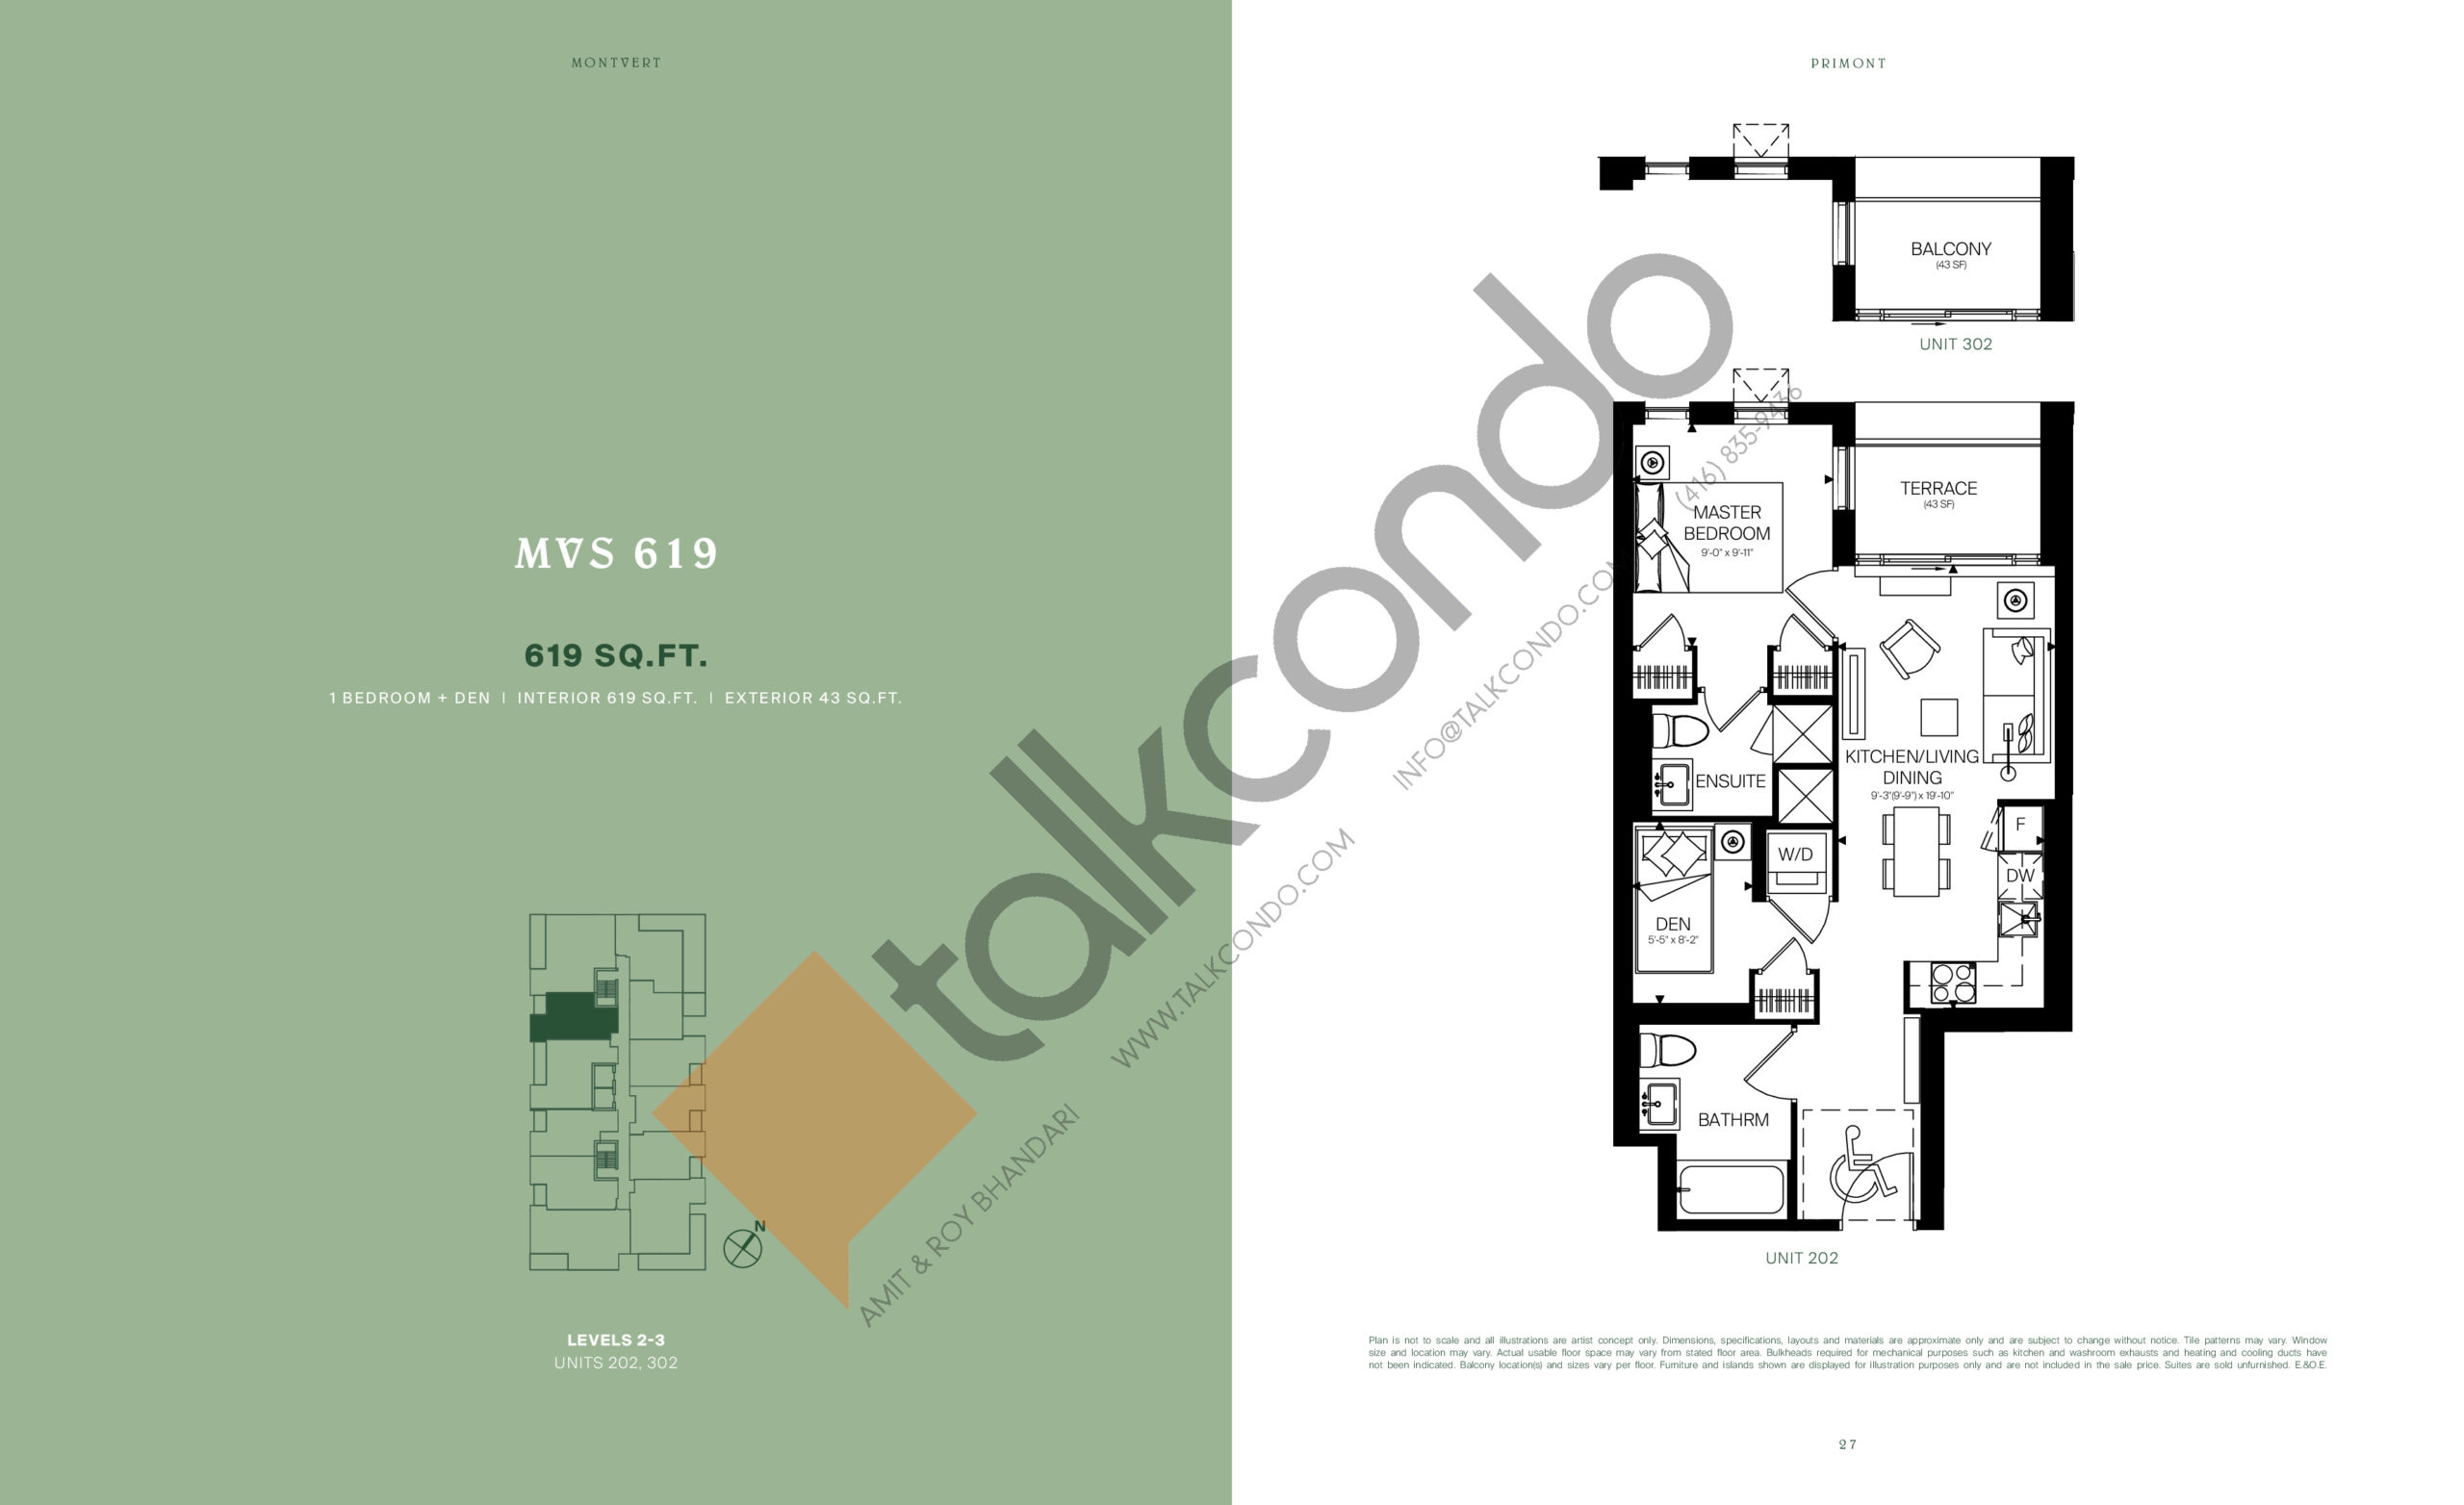 MVS 619 Floor Plan at MontVert Condos - 619 sq.ft